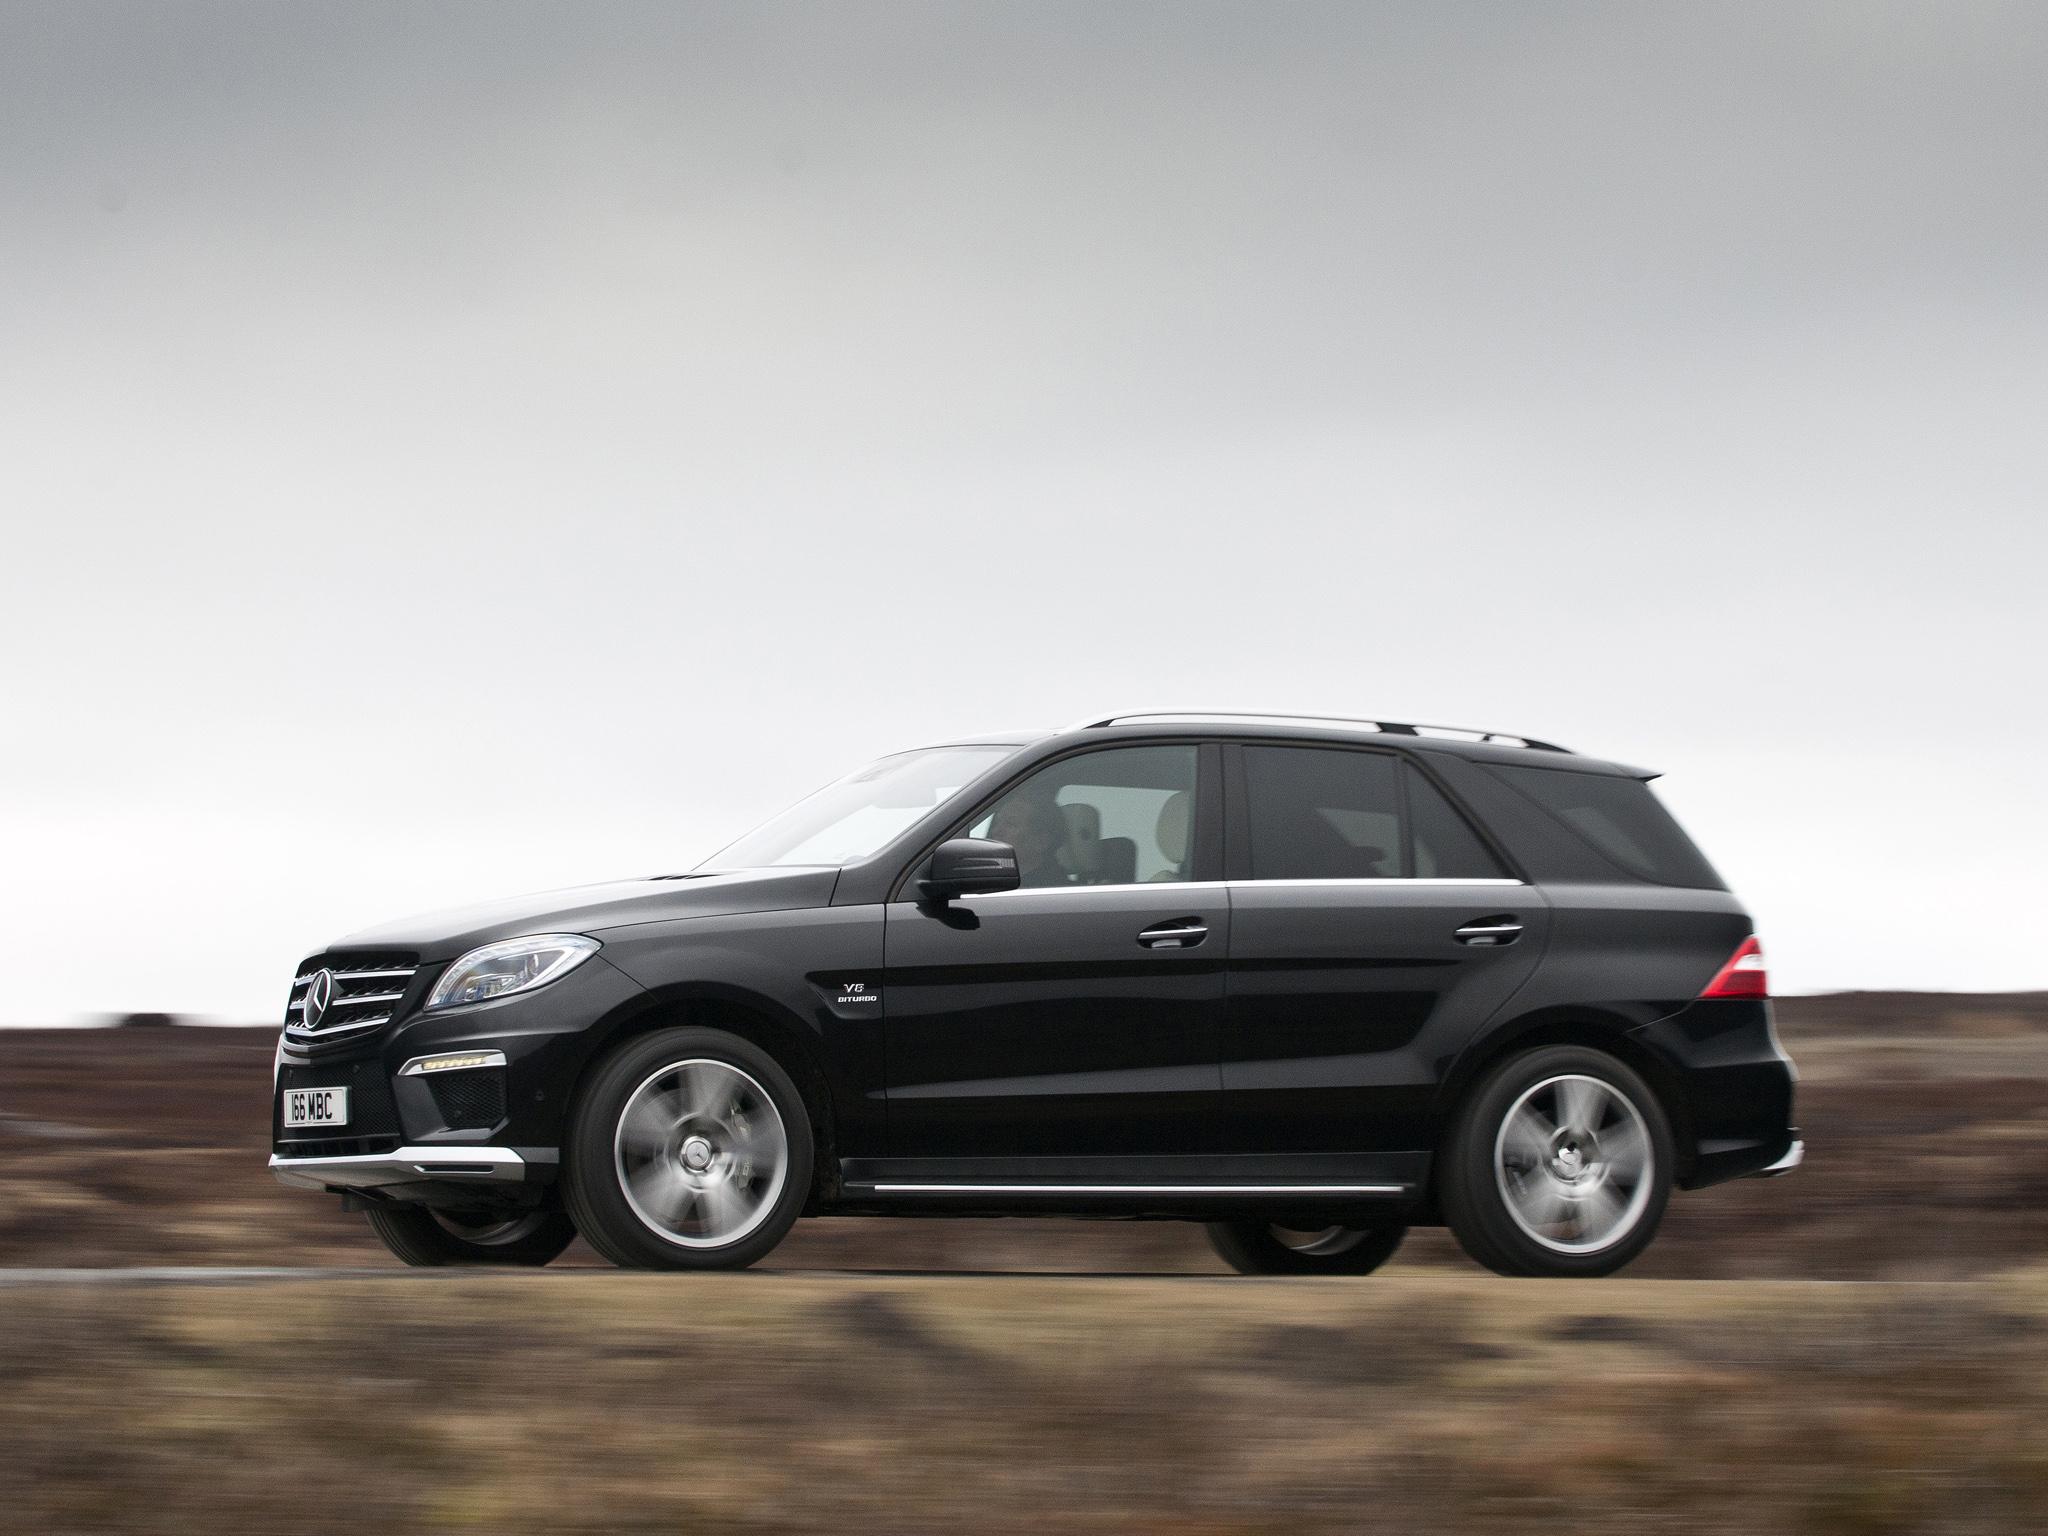 Mercedes ml 300 cdi 2017 2018 best cars reviews for Mercedes benz ml 300